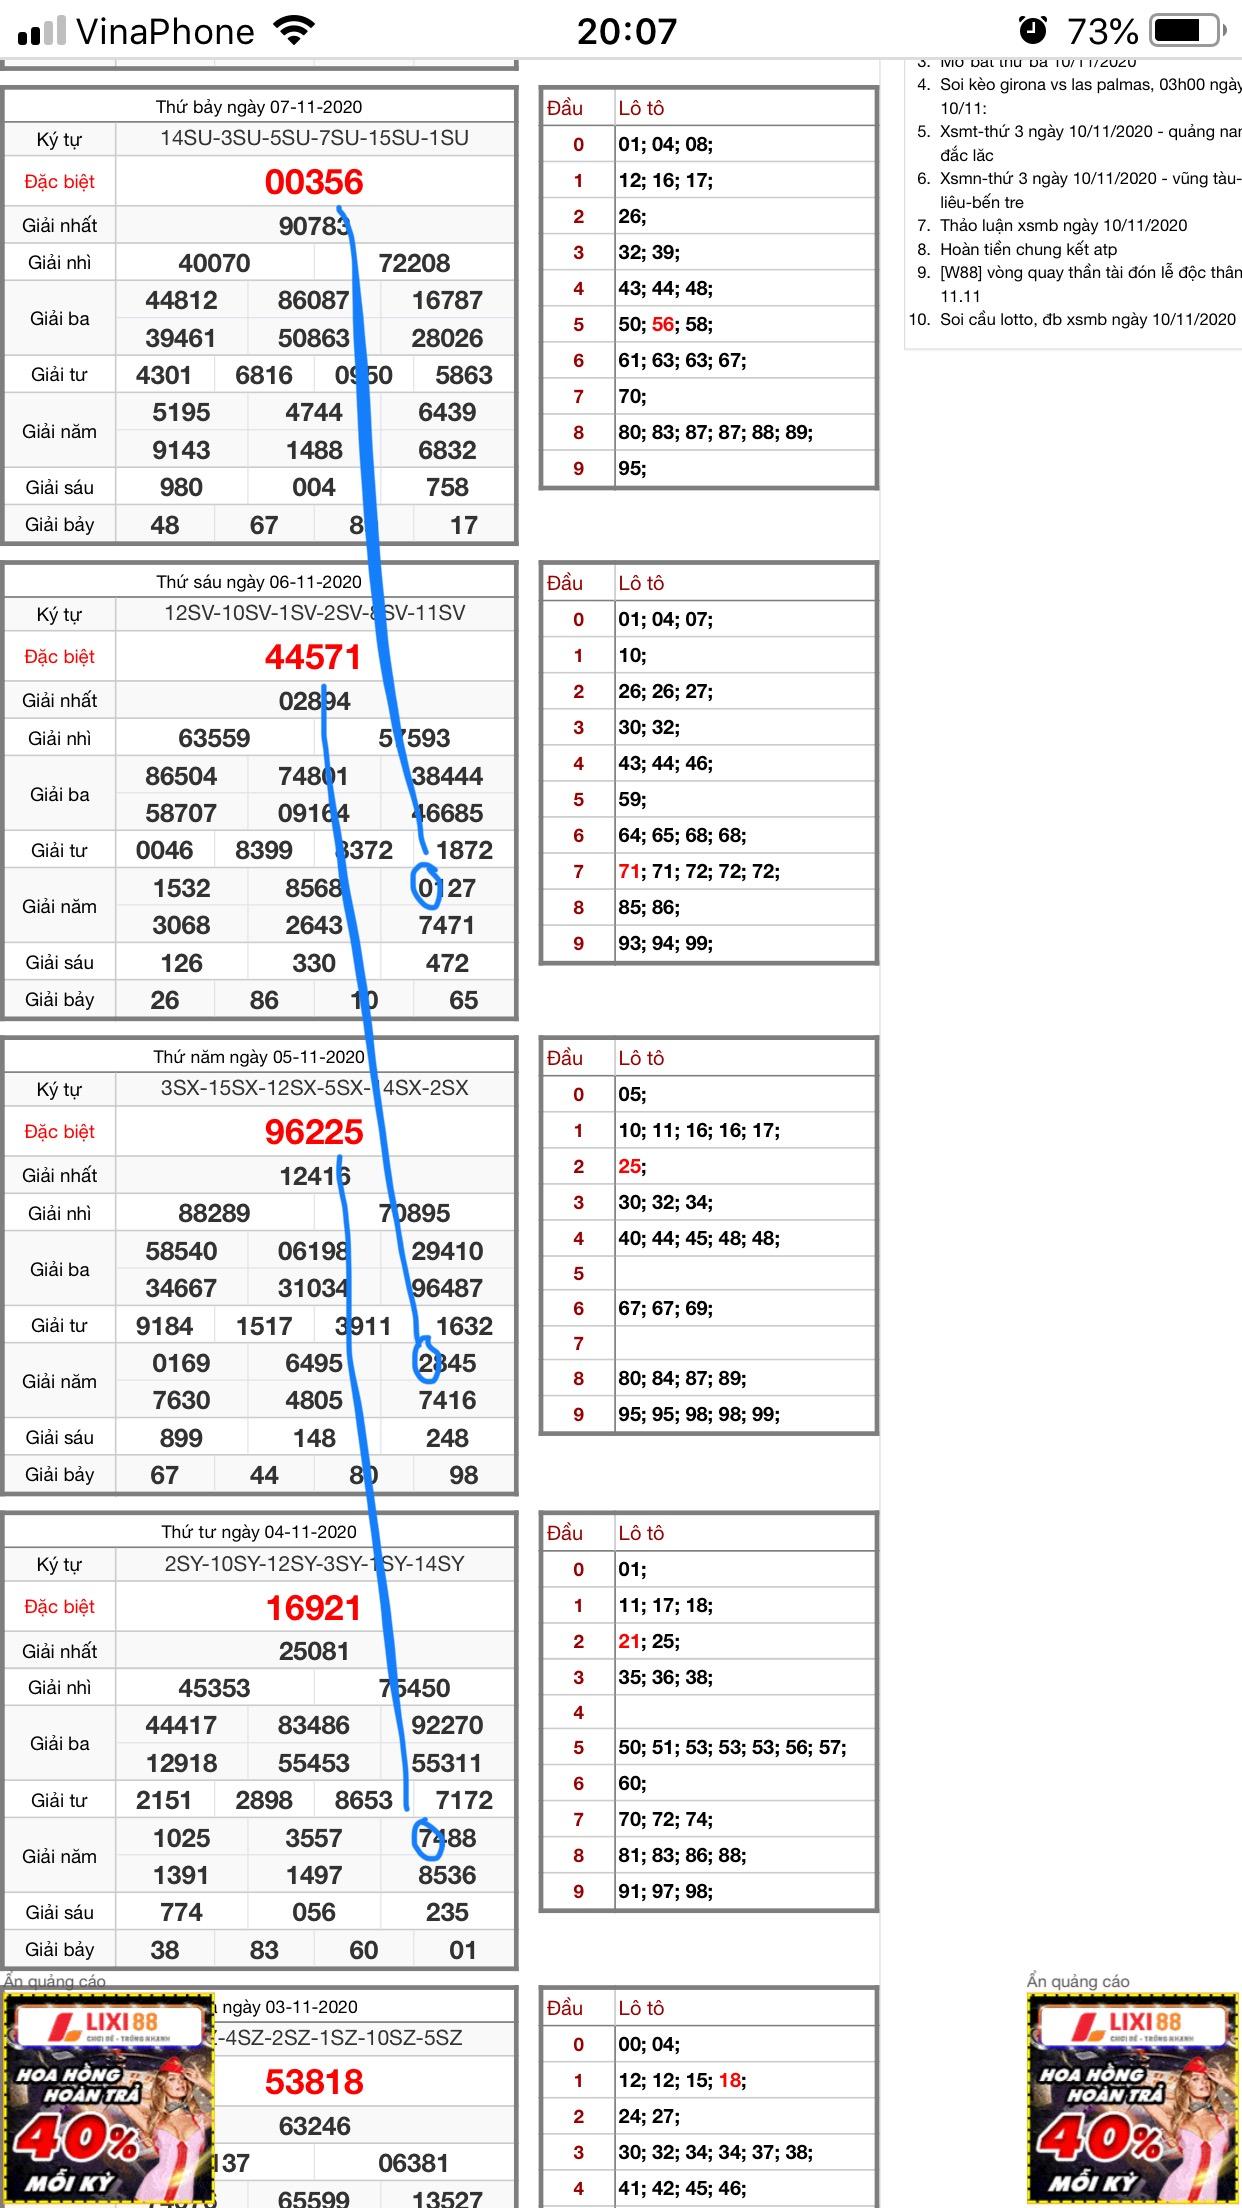 E5E26812-80C2-4D76-8239-FCED35FBF142.jpeg